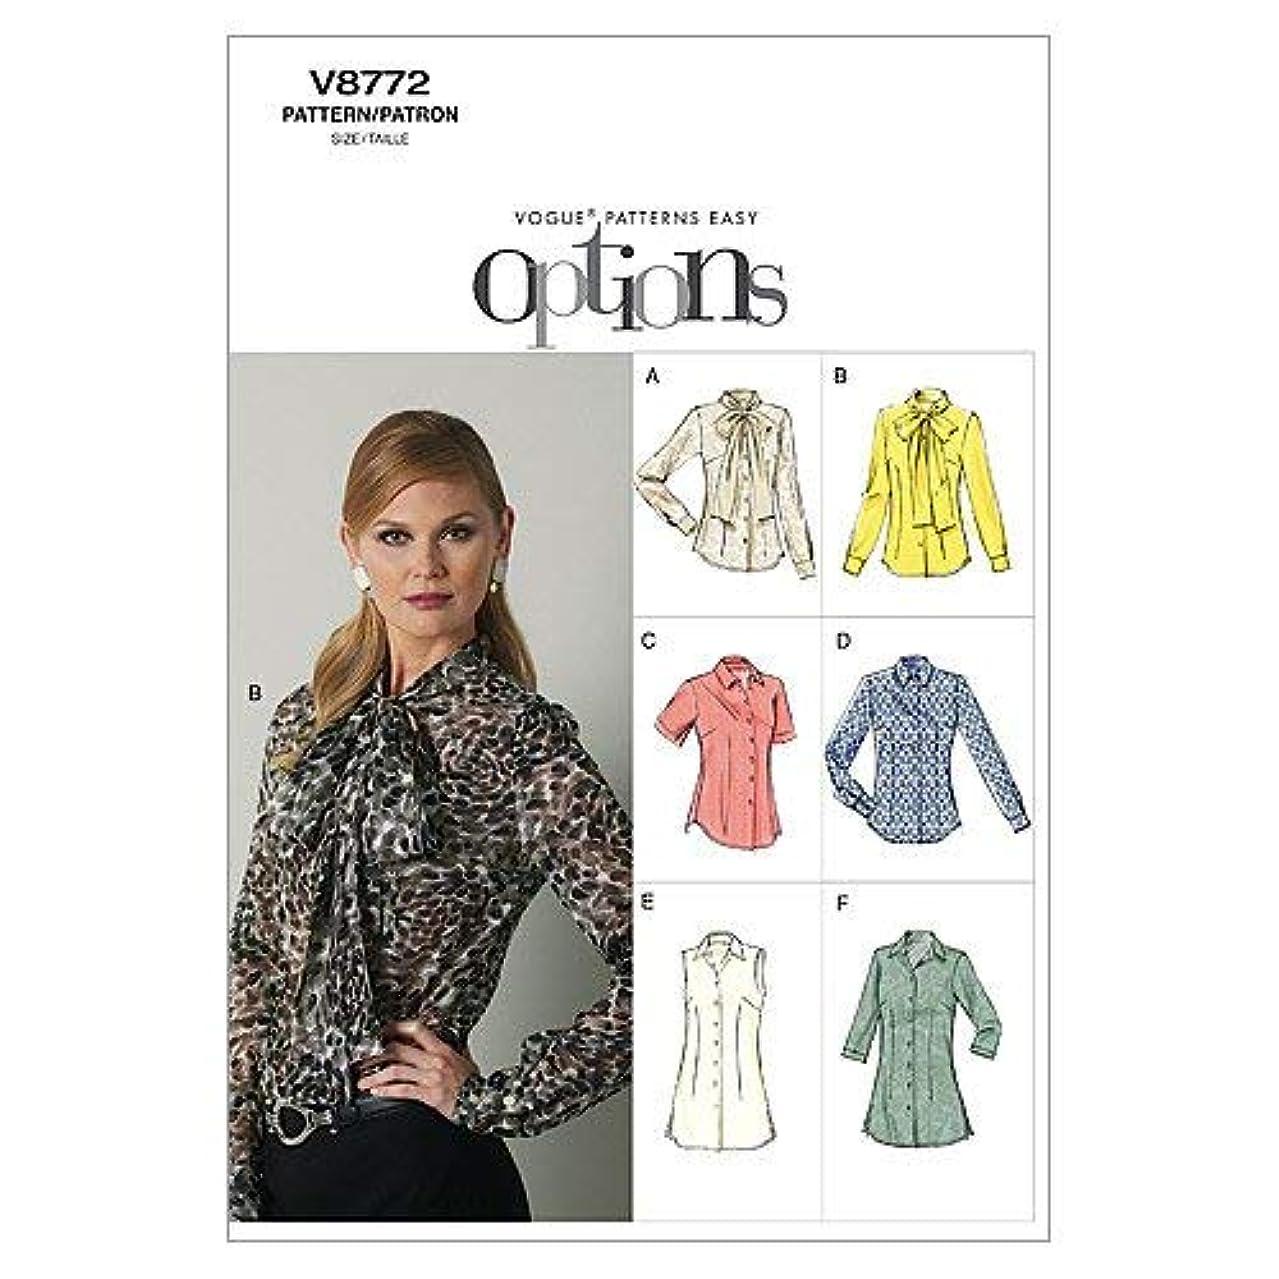 Vogue Patterns V8772 Misses' Blouse, Size A5 (6-8-10-12-14)